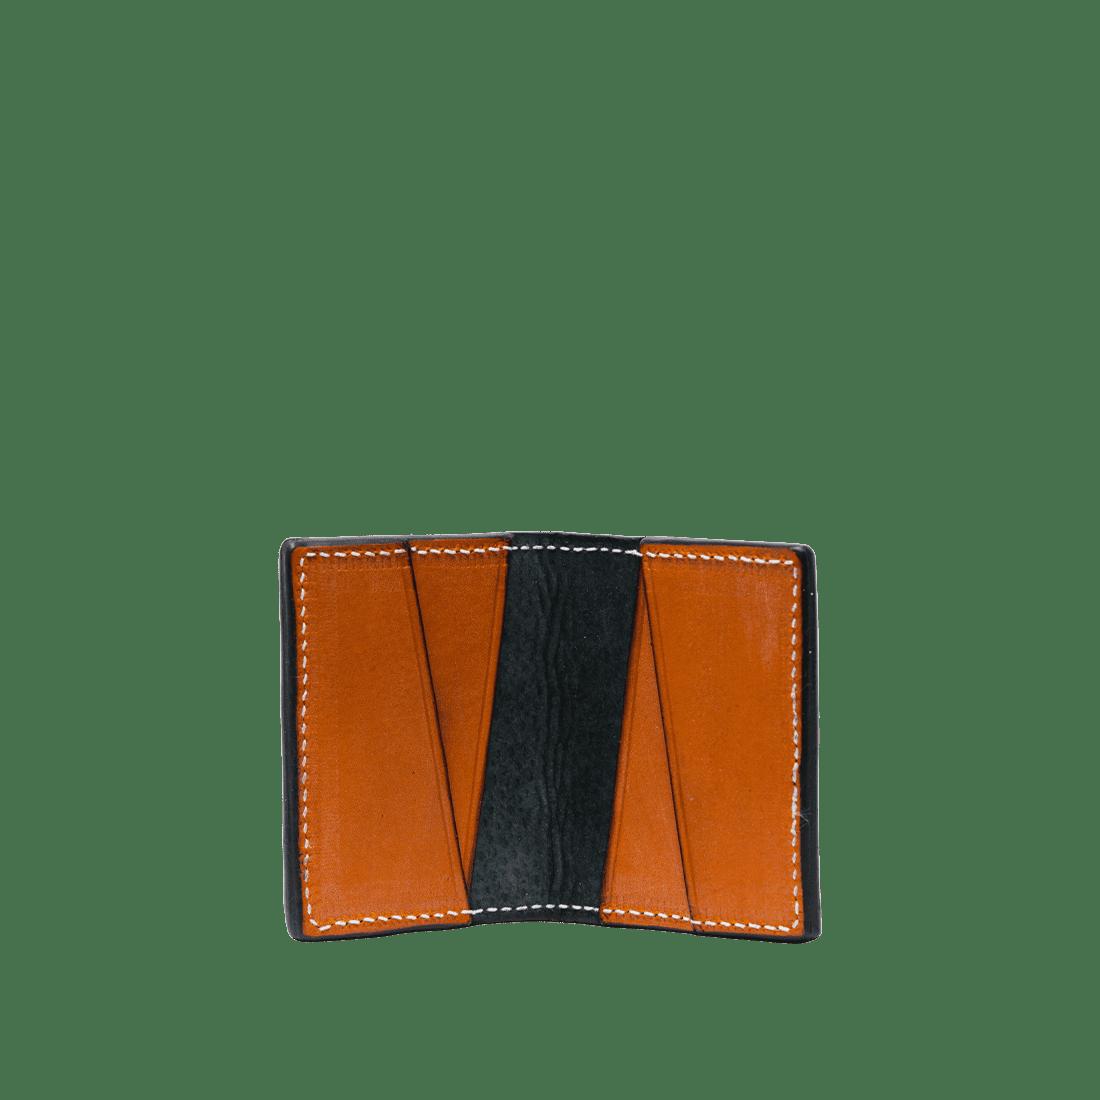 The Double Oak Card Holder London Tan